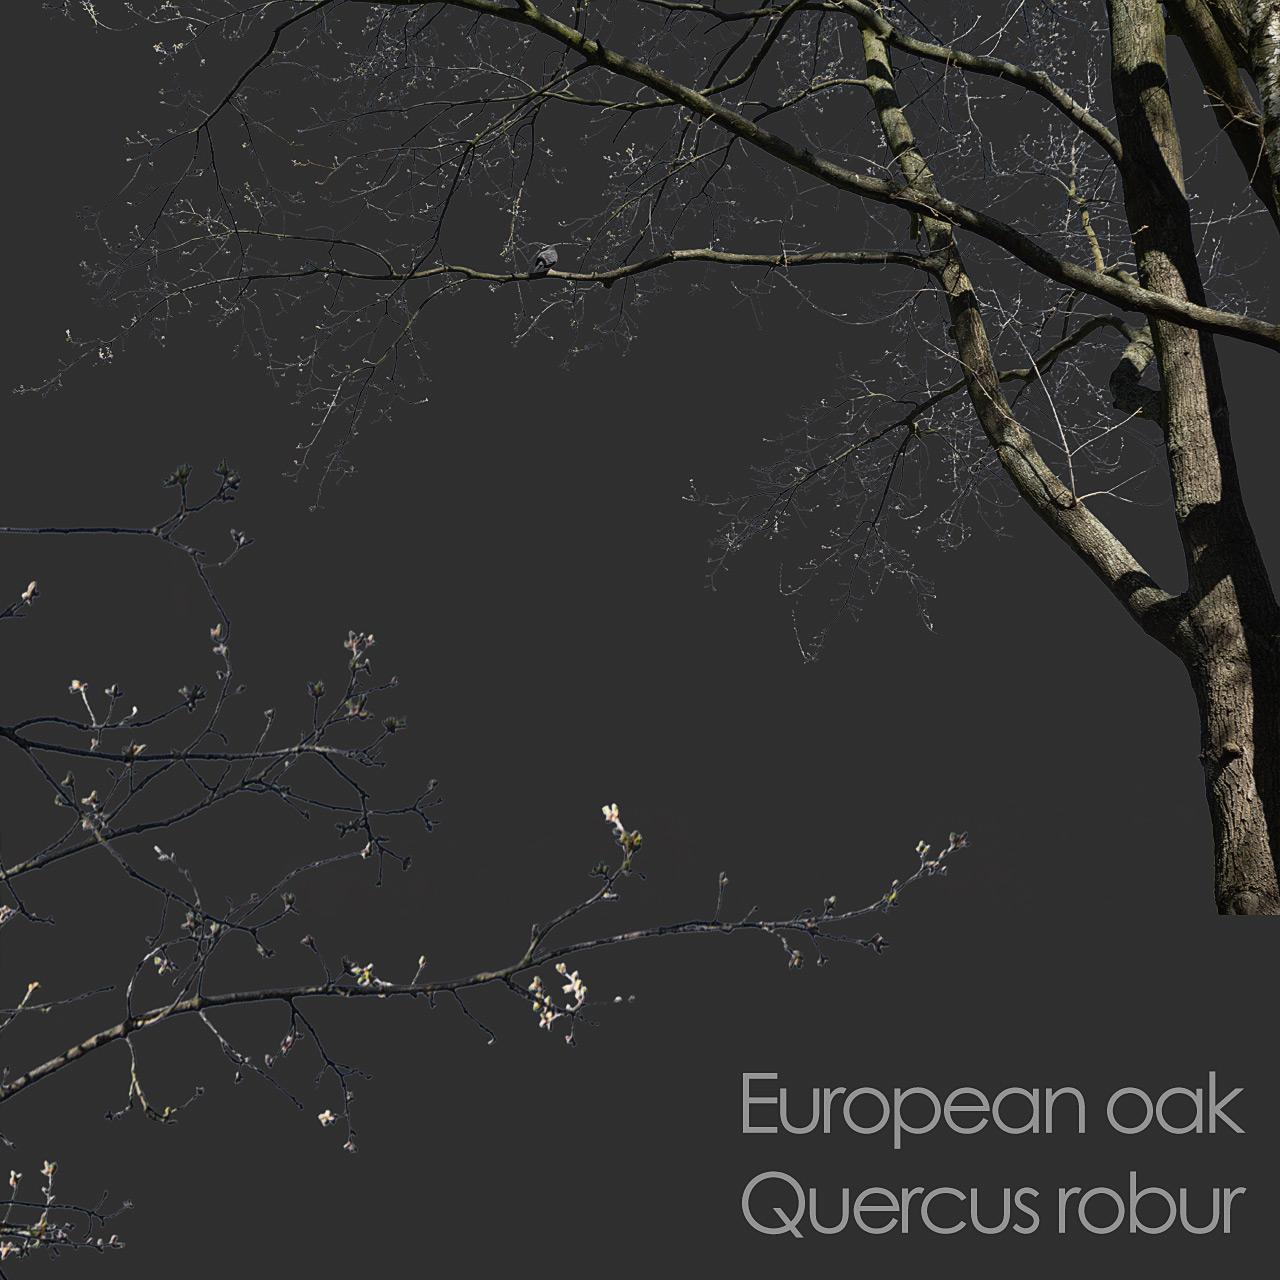 European Oak foreground tree branch cutout